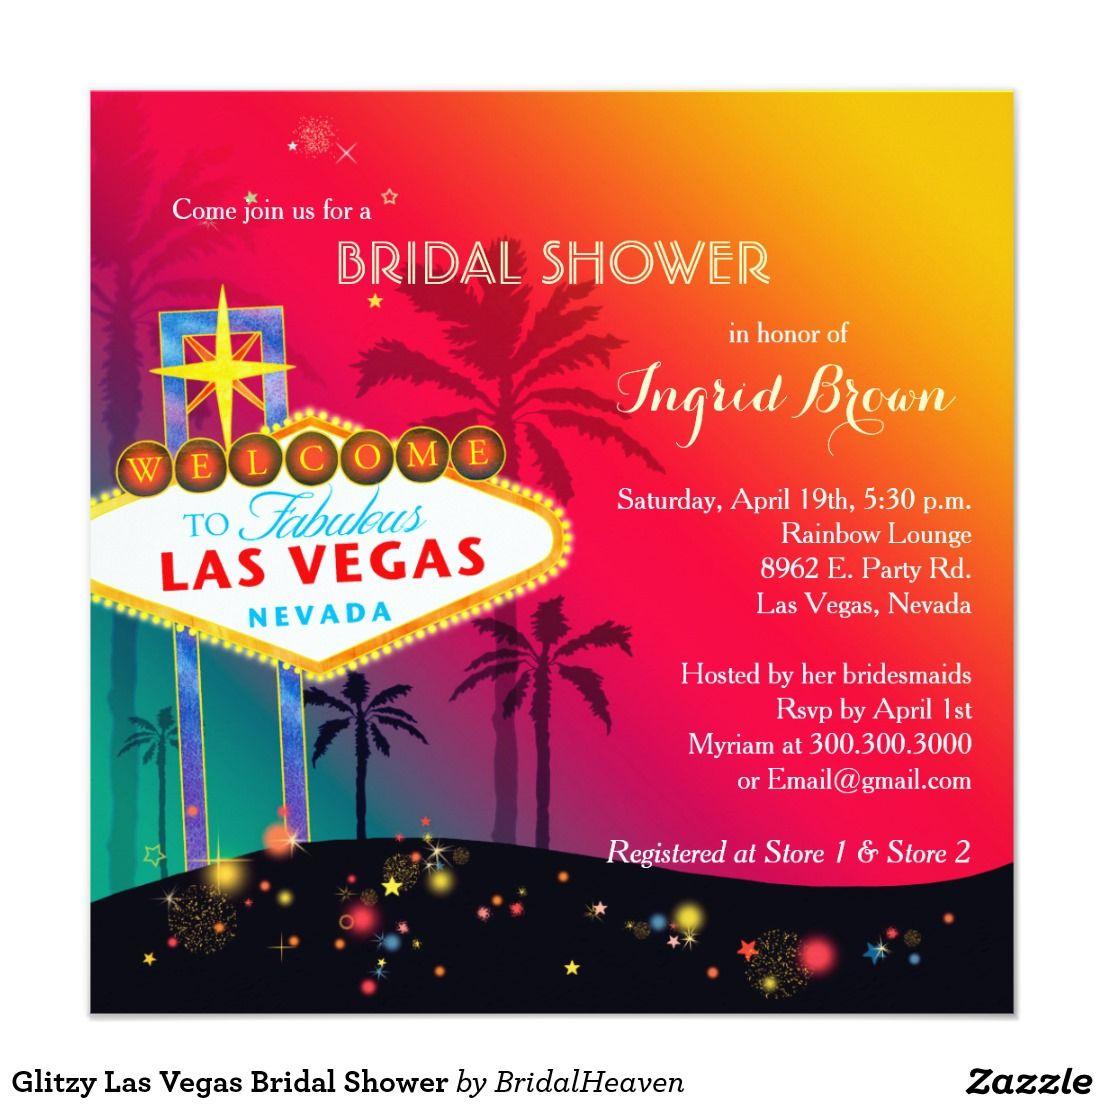 Glitzy Las Vegas Bridal Shower Card | Bridal showers, Shower ...